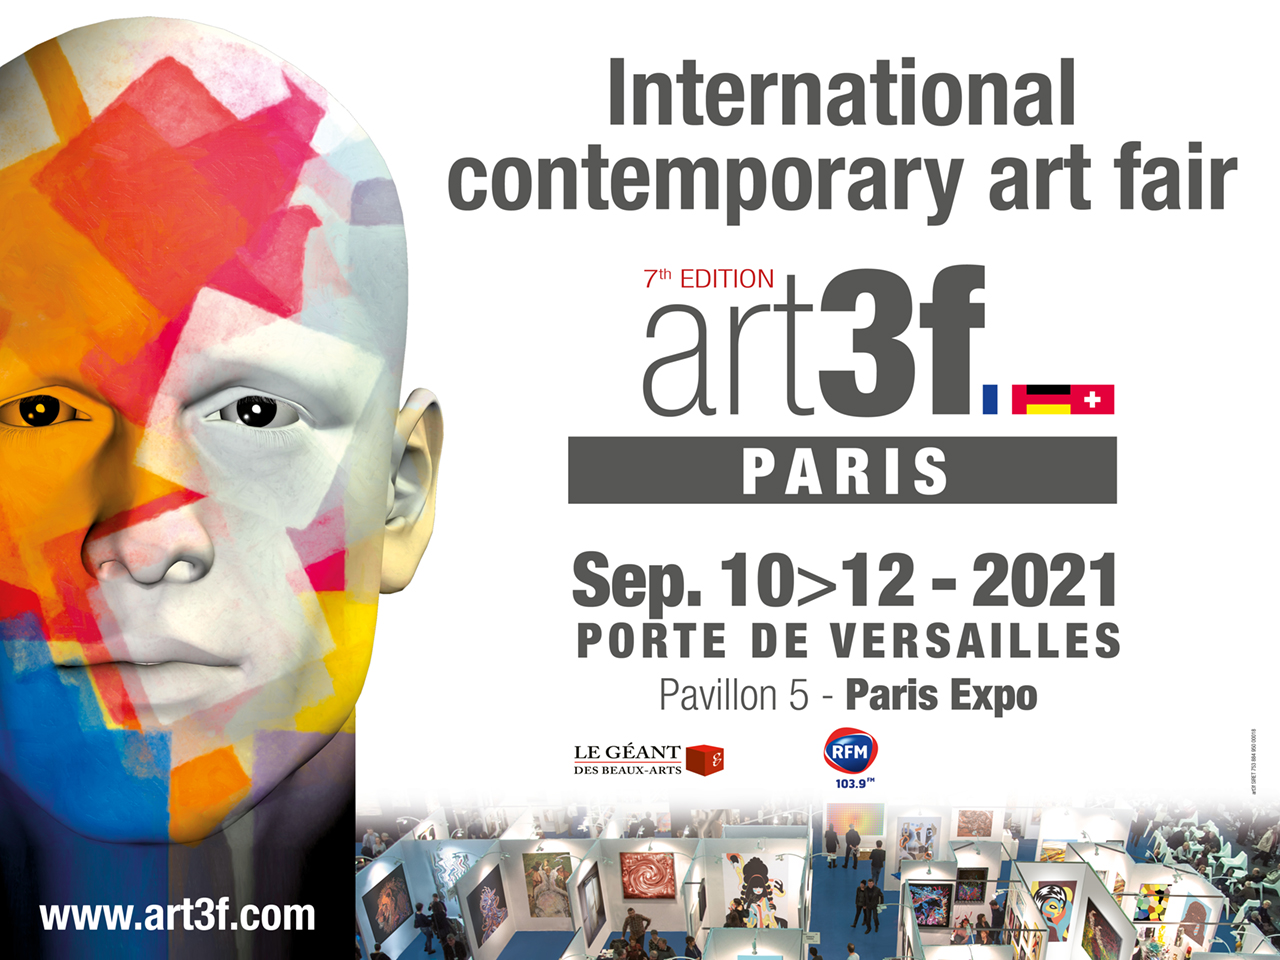 art3f Paris International contemporary art fair